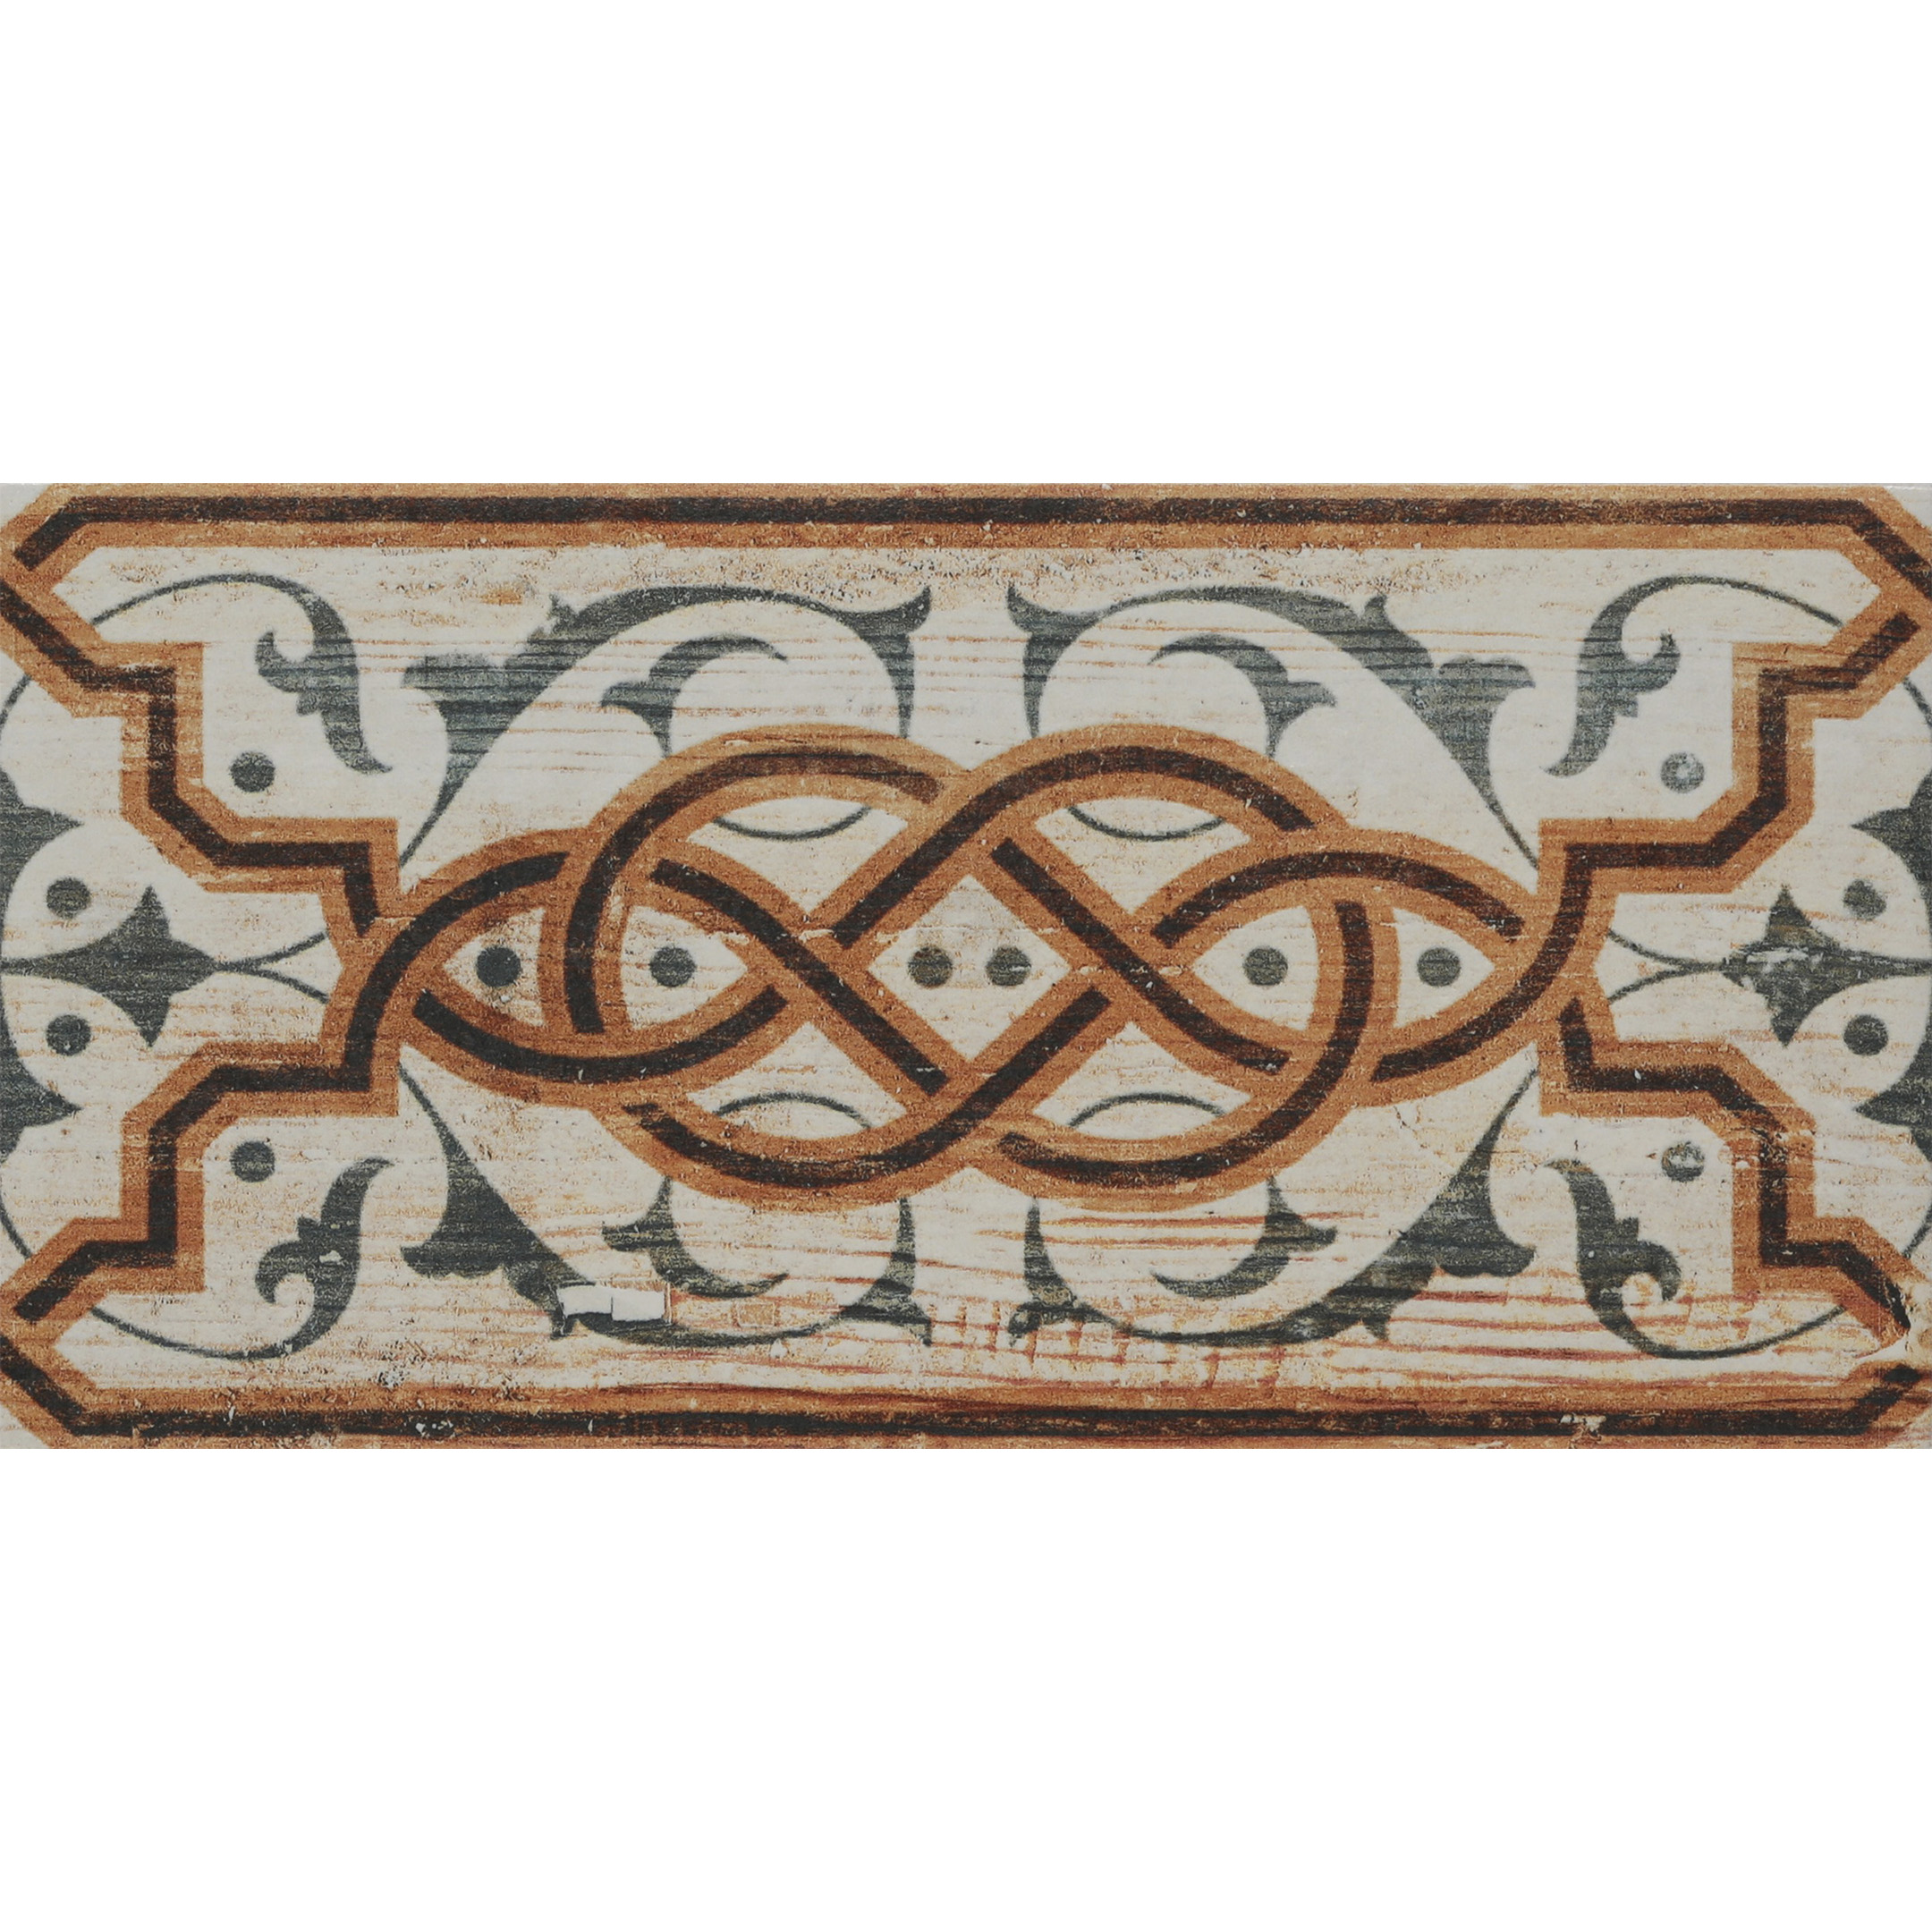 Керамогранит декор Gracia Ceramica Belinda мульти 02 100x200x8 мм (44 шт.=0,88 кв.м) фото